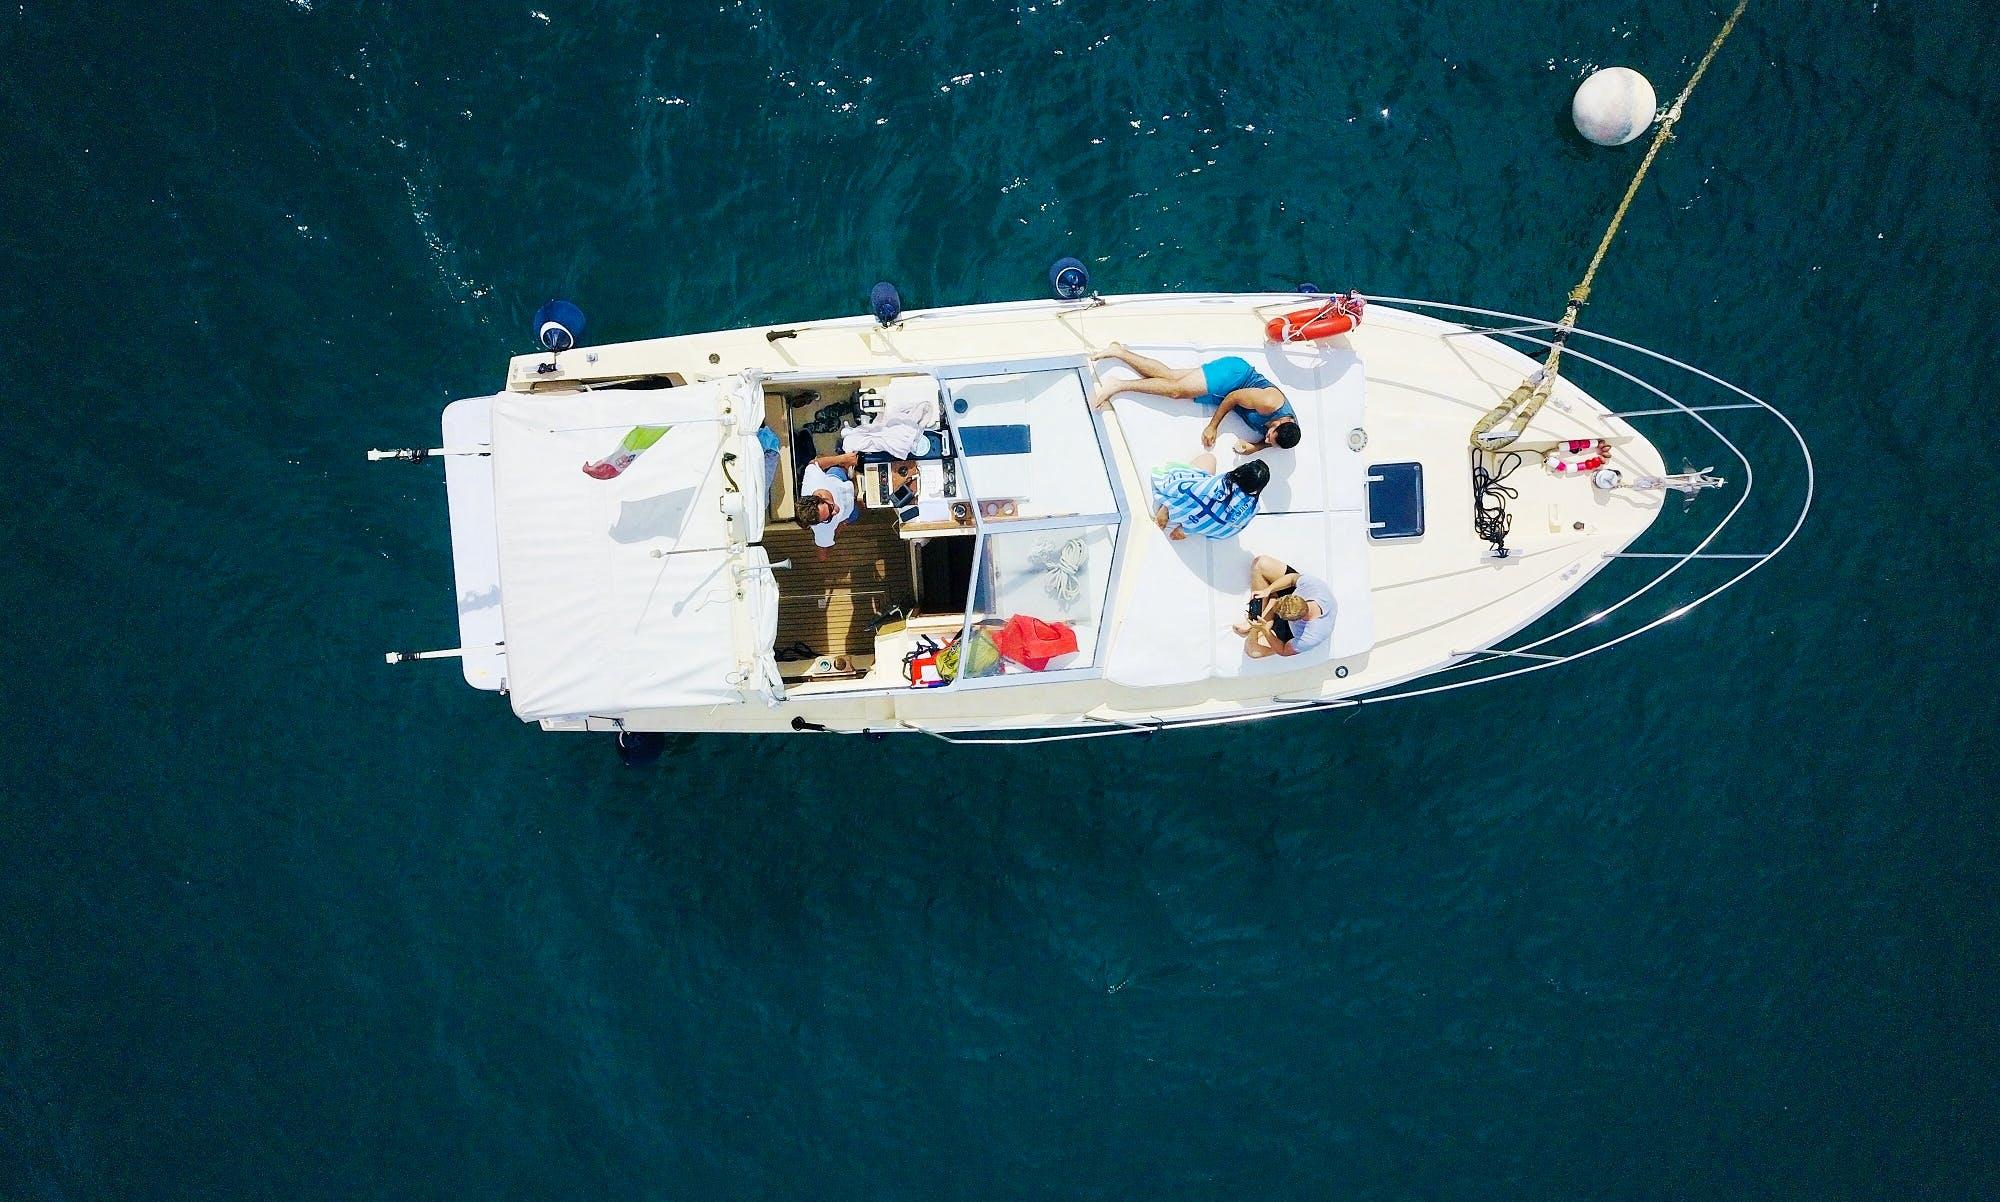 Monterosso al Mare Cruise aboard the Azimut 28 Motor Yacht